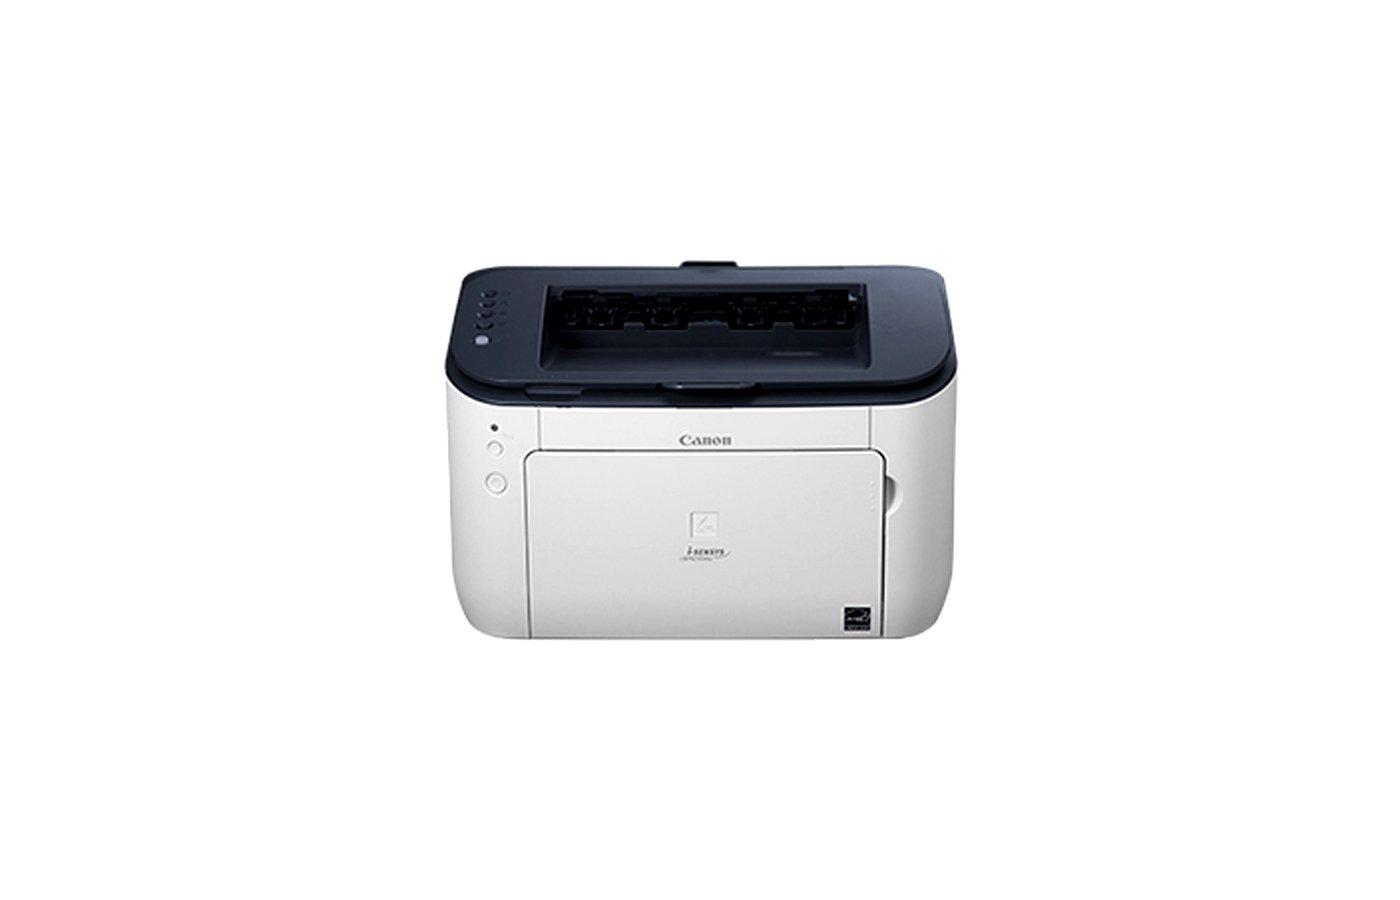 Принтер Canon i-Sensys LBP6230DW /9143B003/